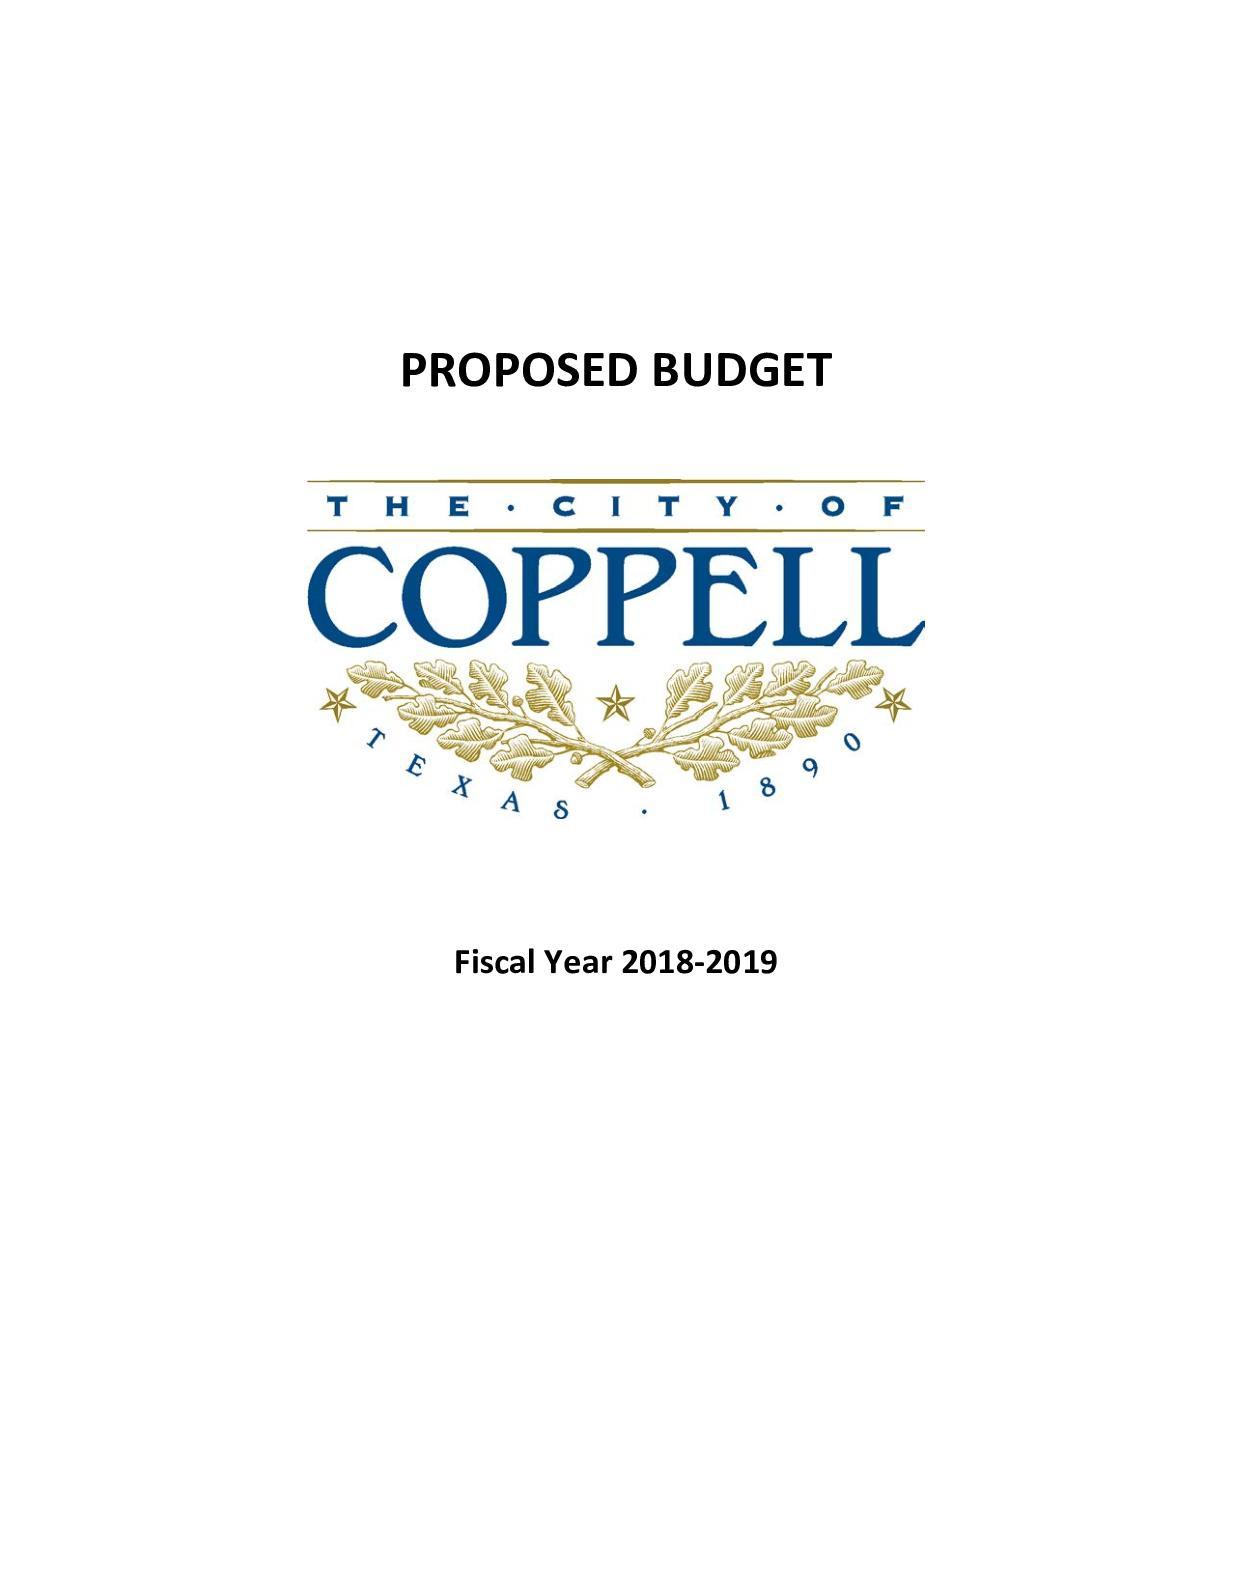 calaméo proposed budget 2018 2019Online Lead Generation Sales Lead Management System 347340 #21